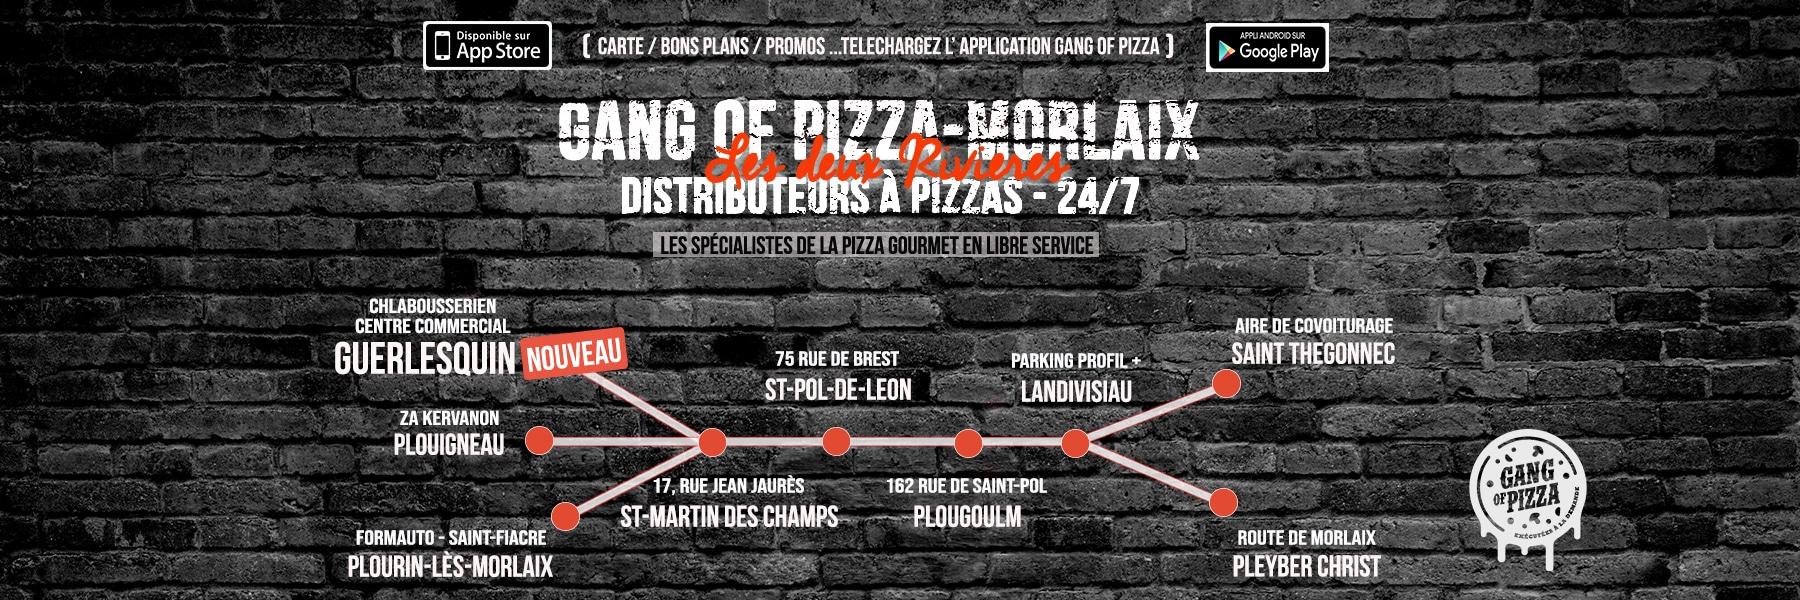 morlaix-les-2-rivieres-gang-of-pizza-debarque-a-guerlesquin-pizzas-24-7-recette-gourmet-originale-gangster-distributeur-libre-service